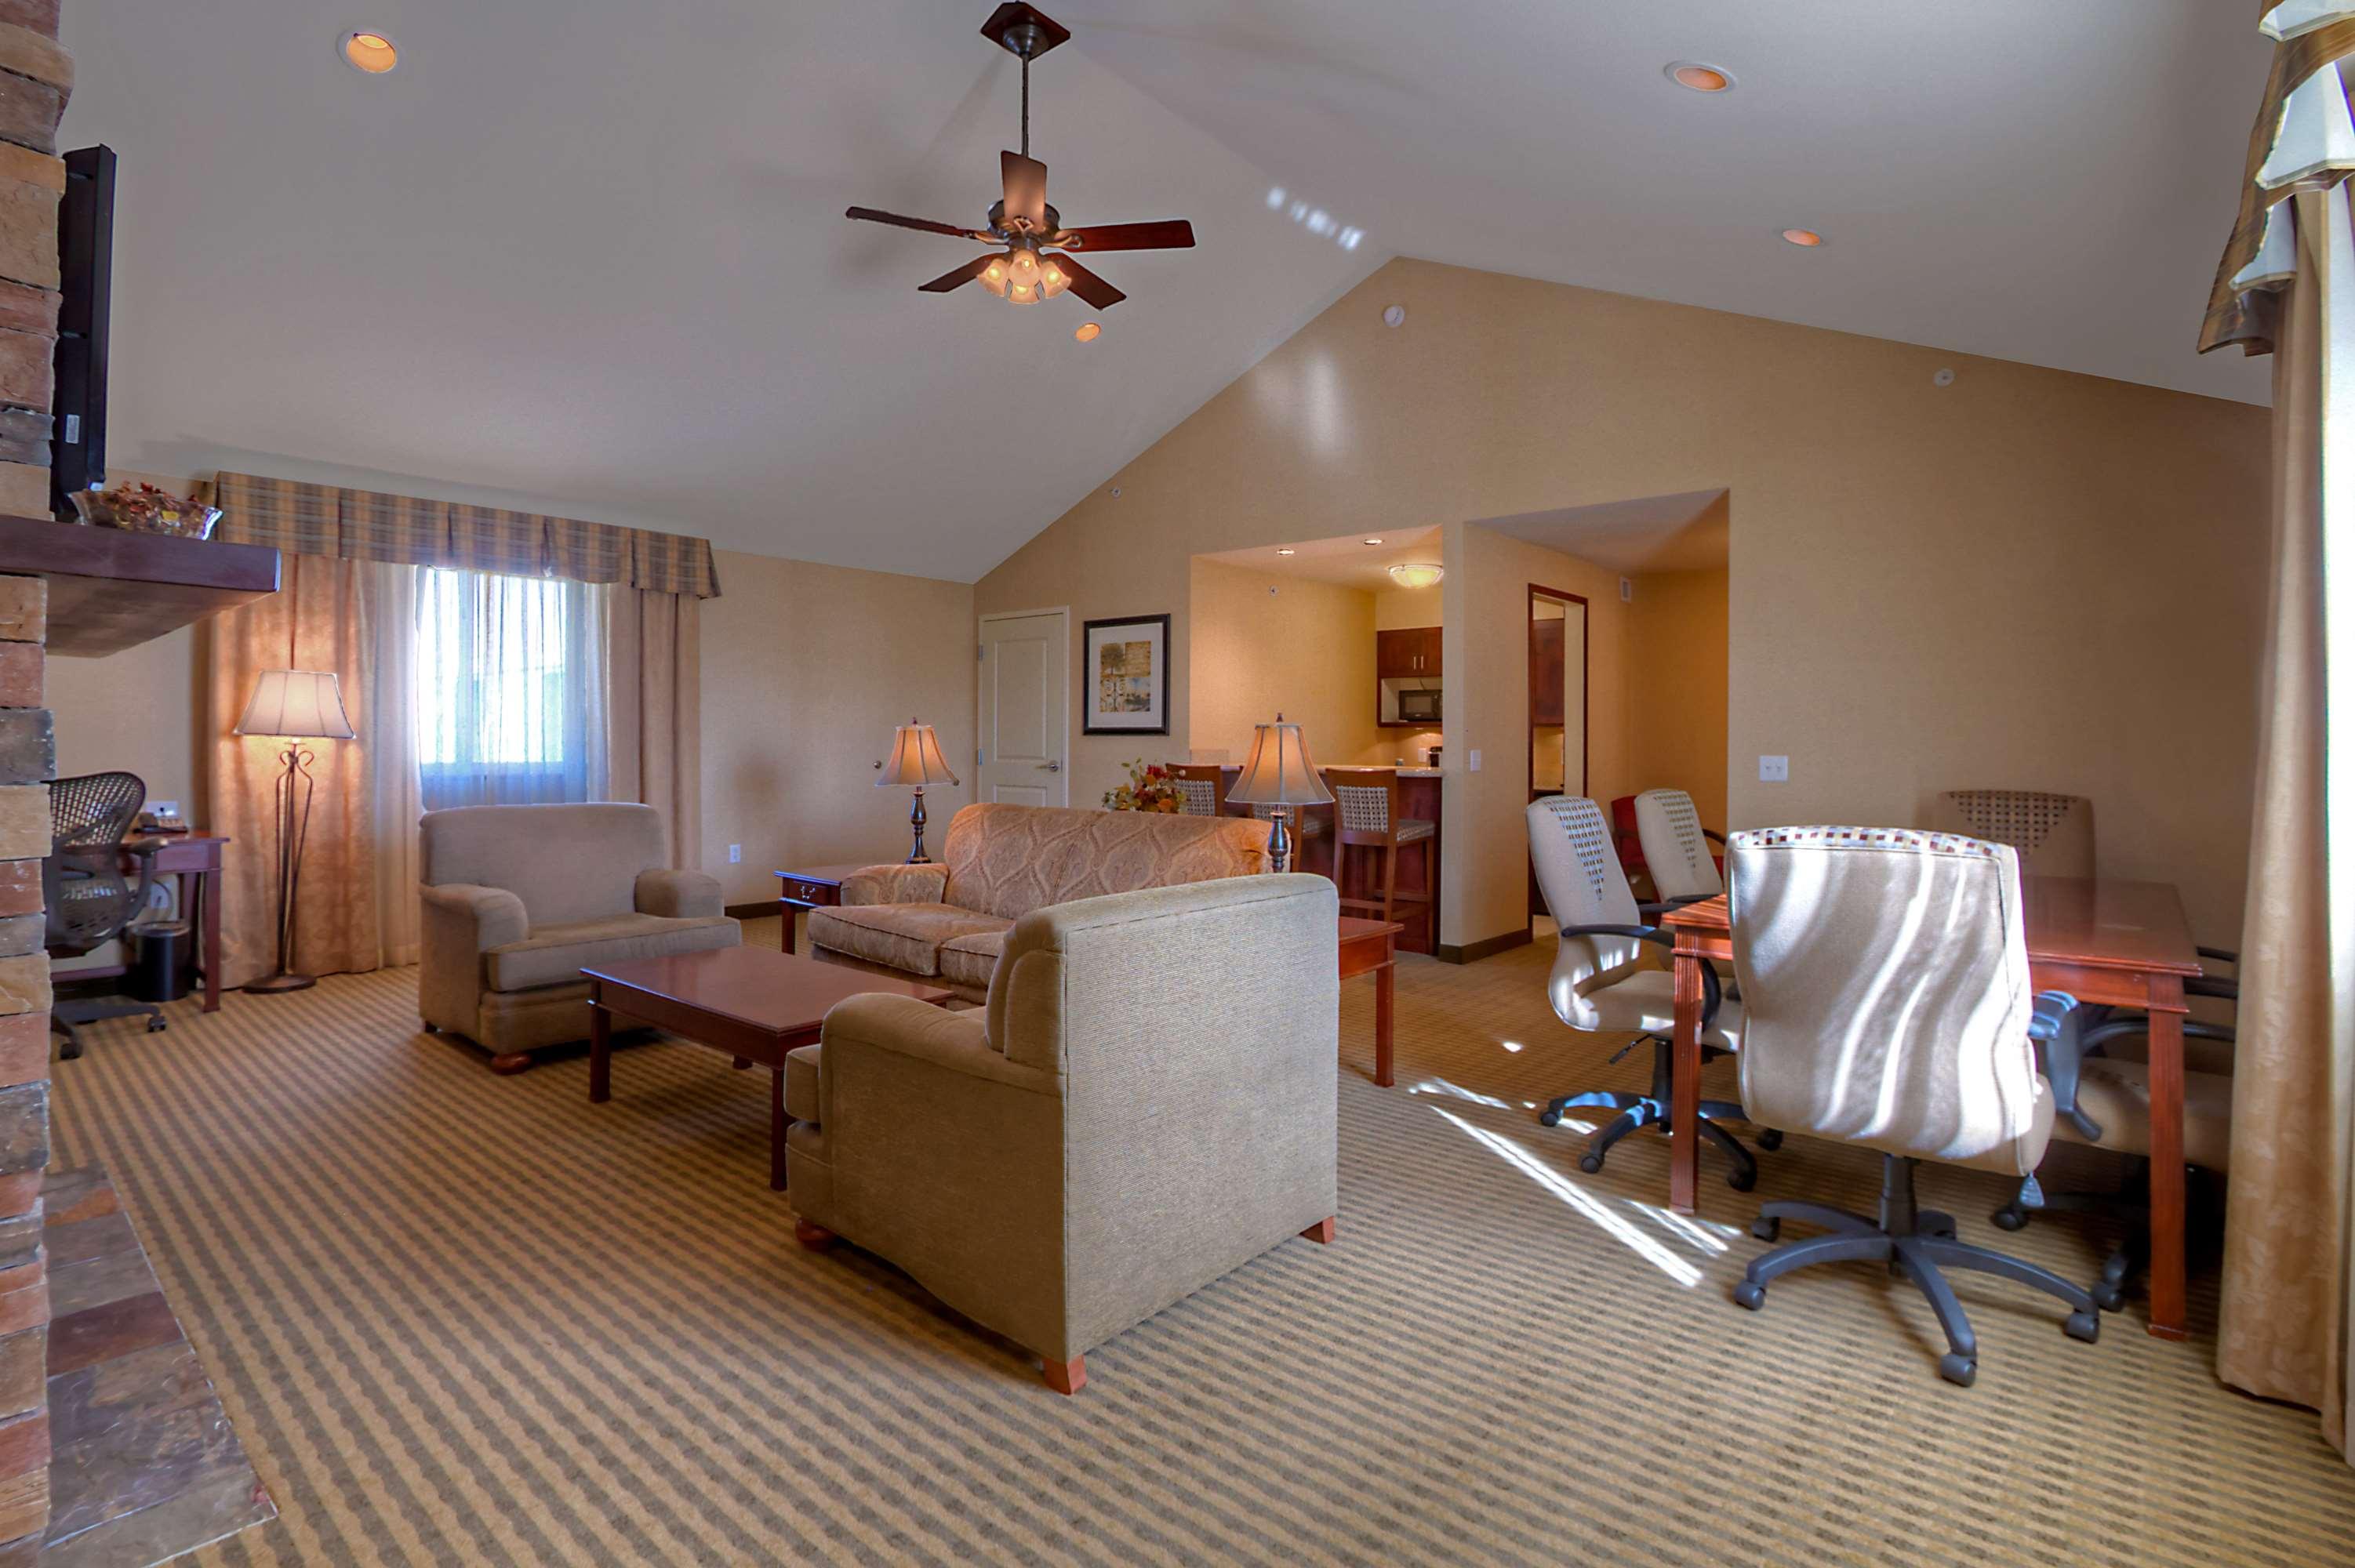 Hilton Garden Inn Great Falls image 17